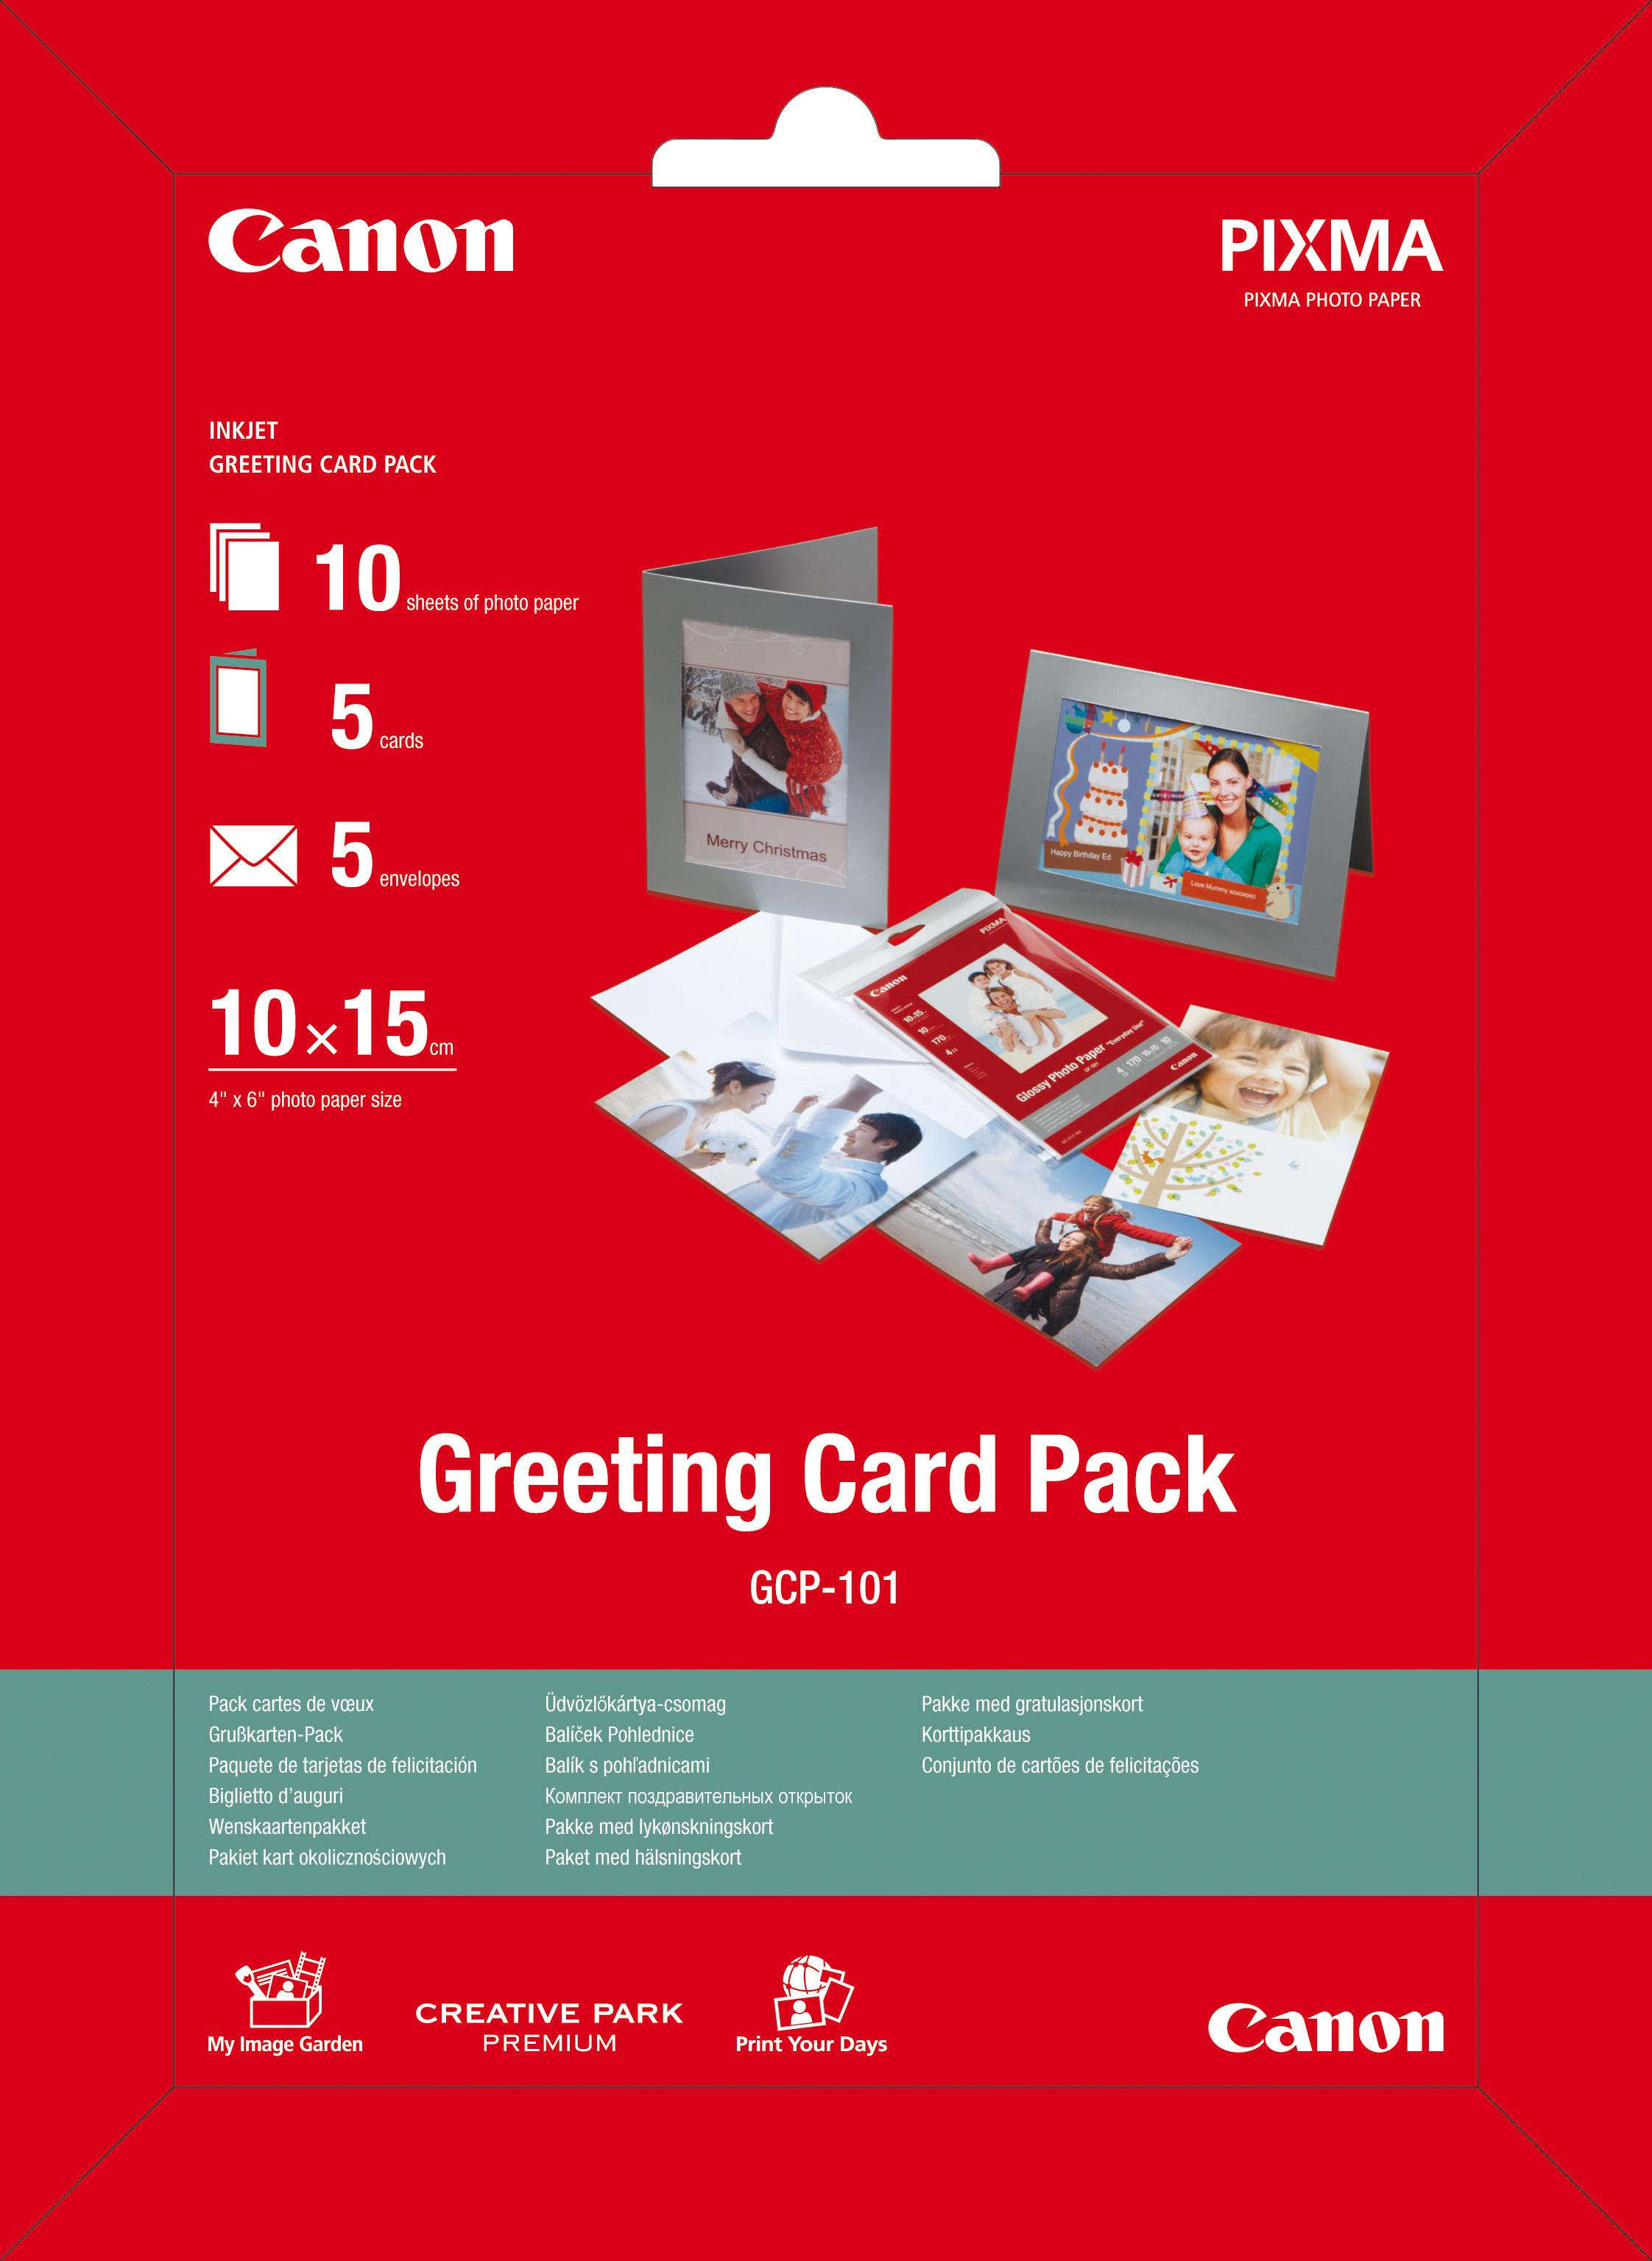 Electronicshop24 Notebooks Computer Tvs Und Vieles Mehr Zu Top Pop Ice Paket Bundle Canon Gp 501 Greetin Card Pack 100x150mm 10 Blatt